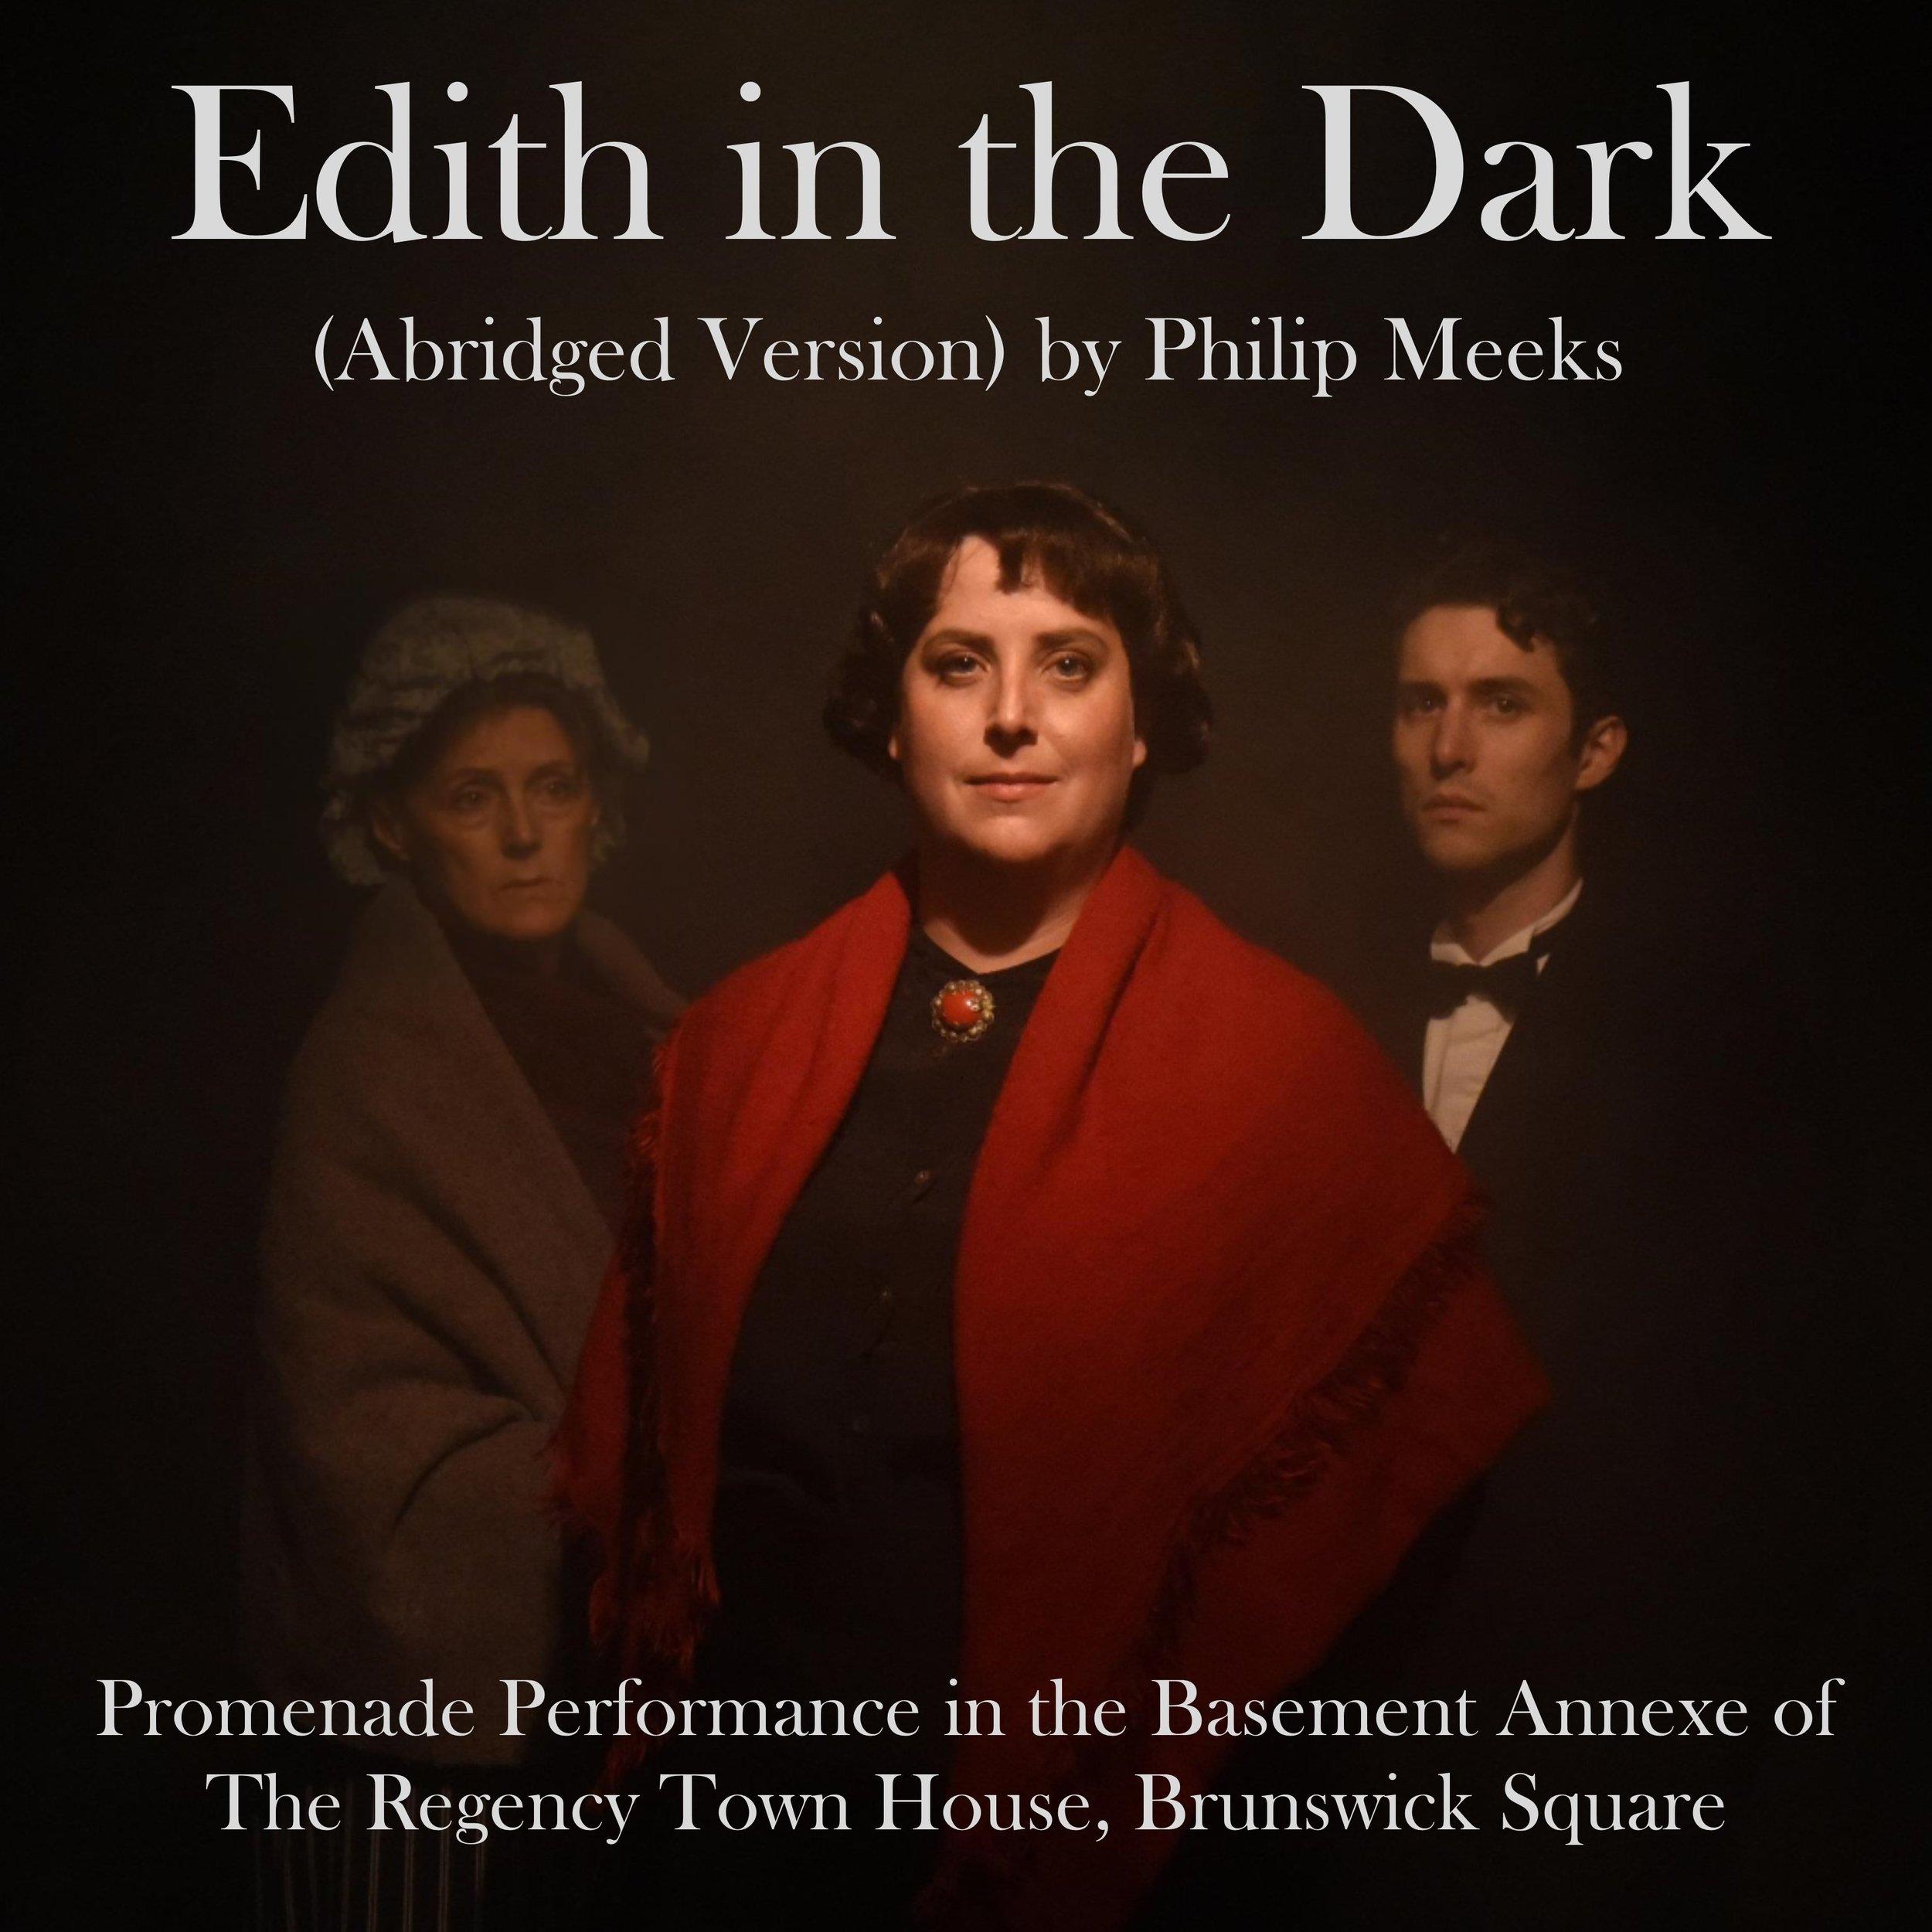 Edith in the Dark web image regency house.jpg